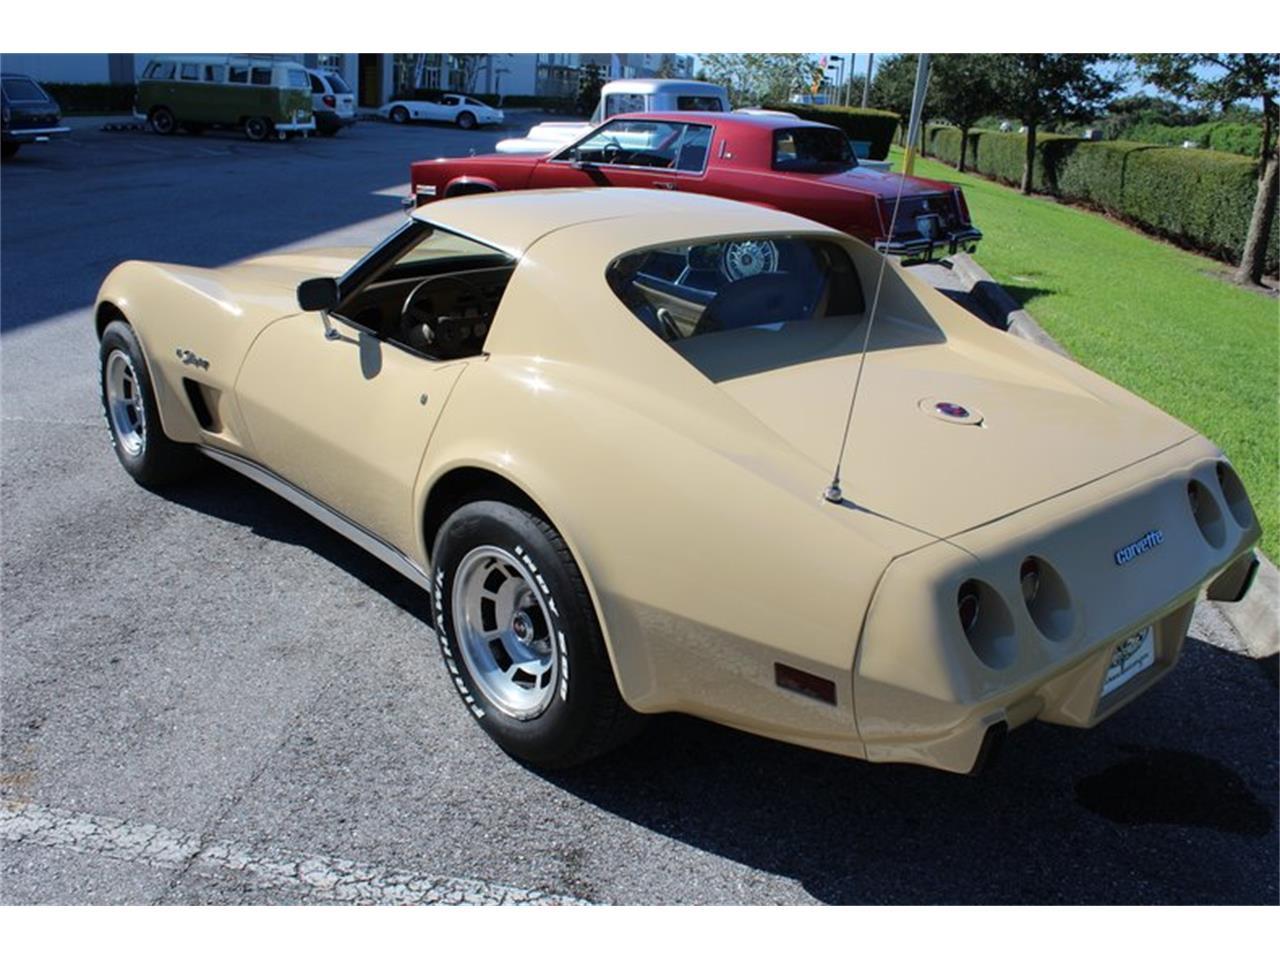 1976 Chevrolet Corvette (CC-1230230) for sale in Sarasota, Florida